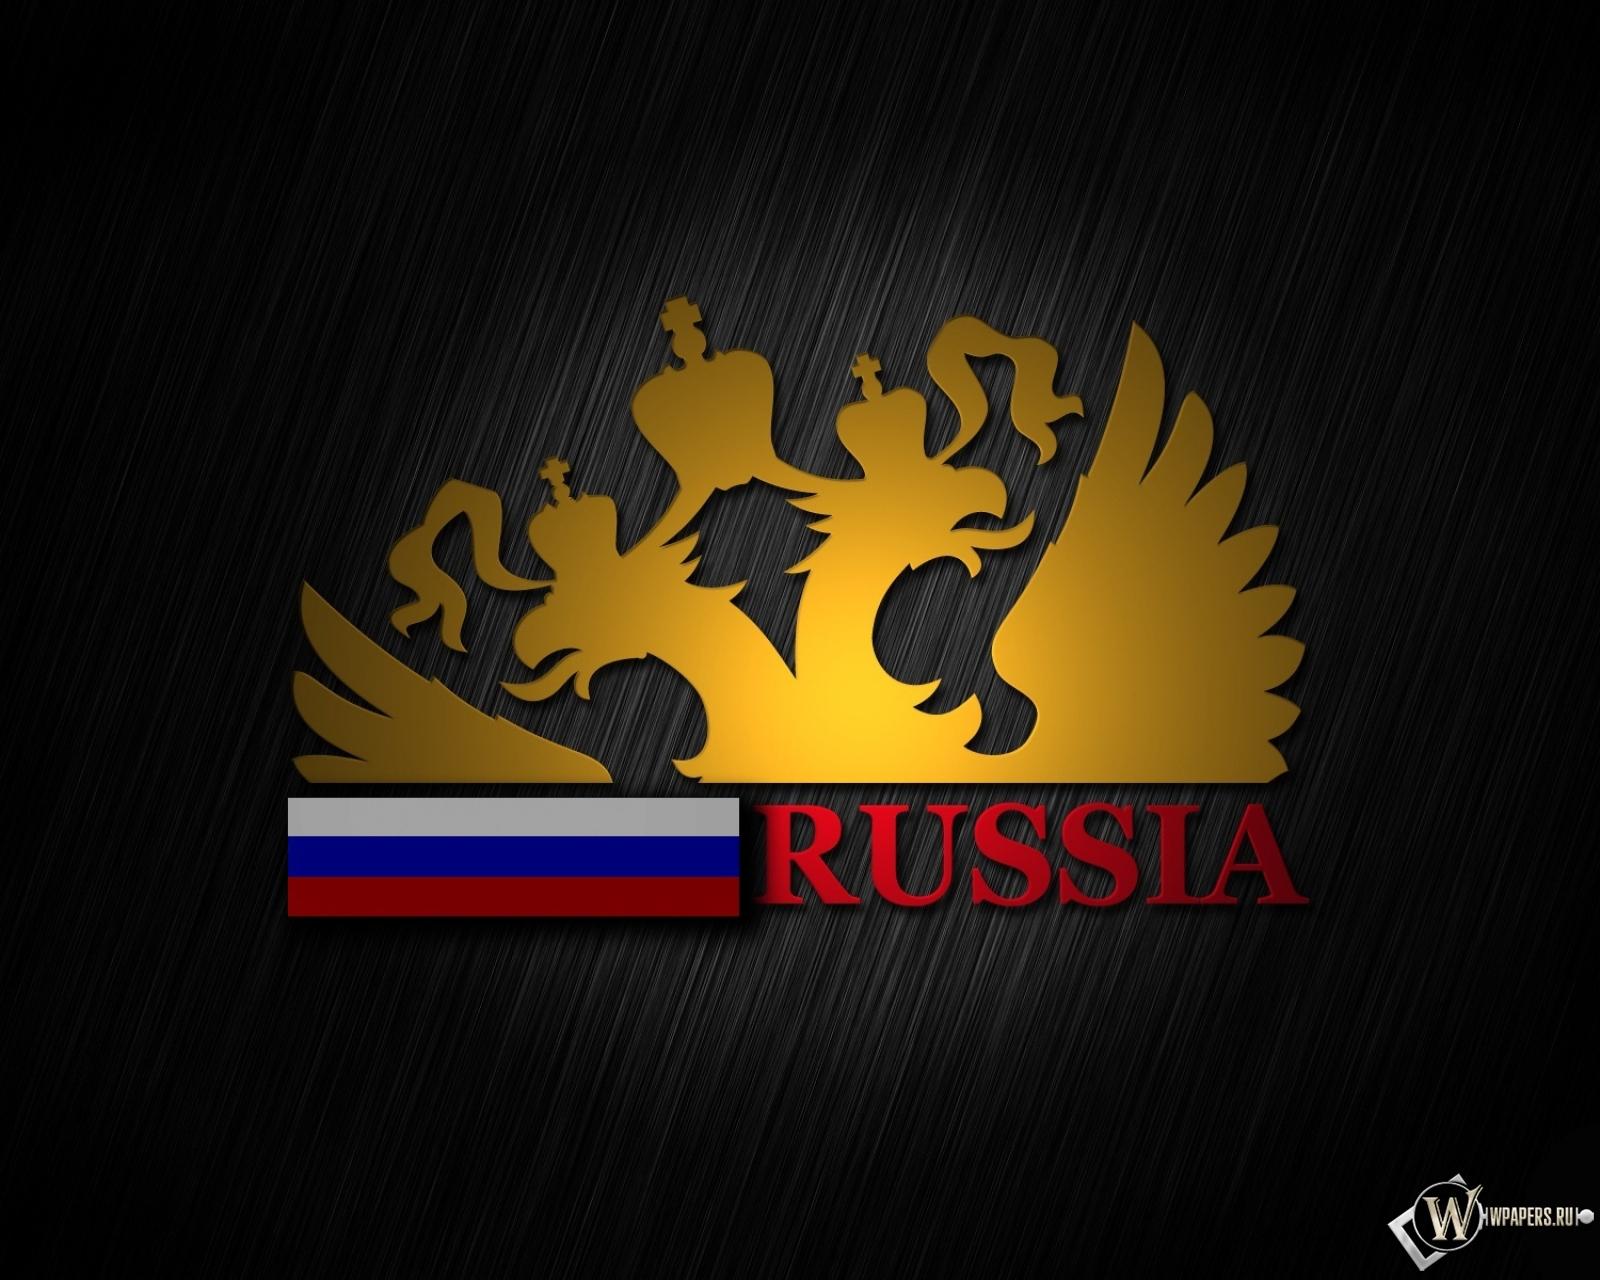 Обои на рабочий стол 1920х1080 россия